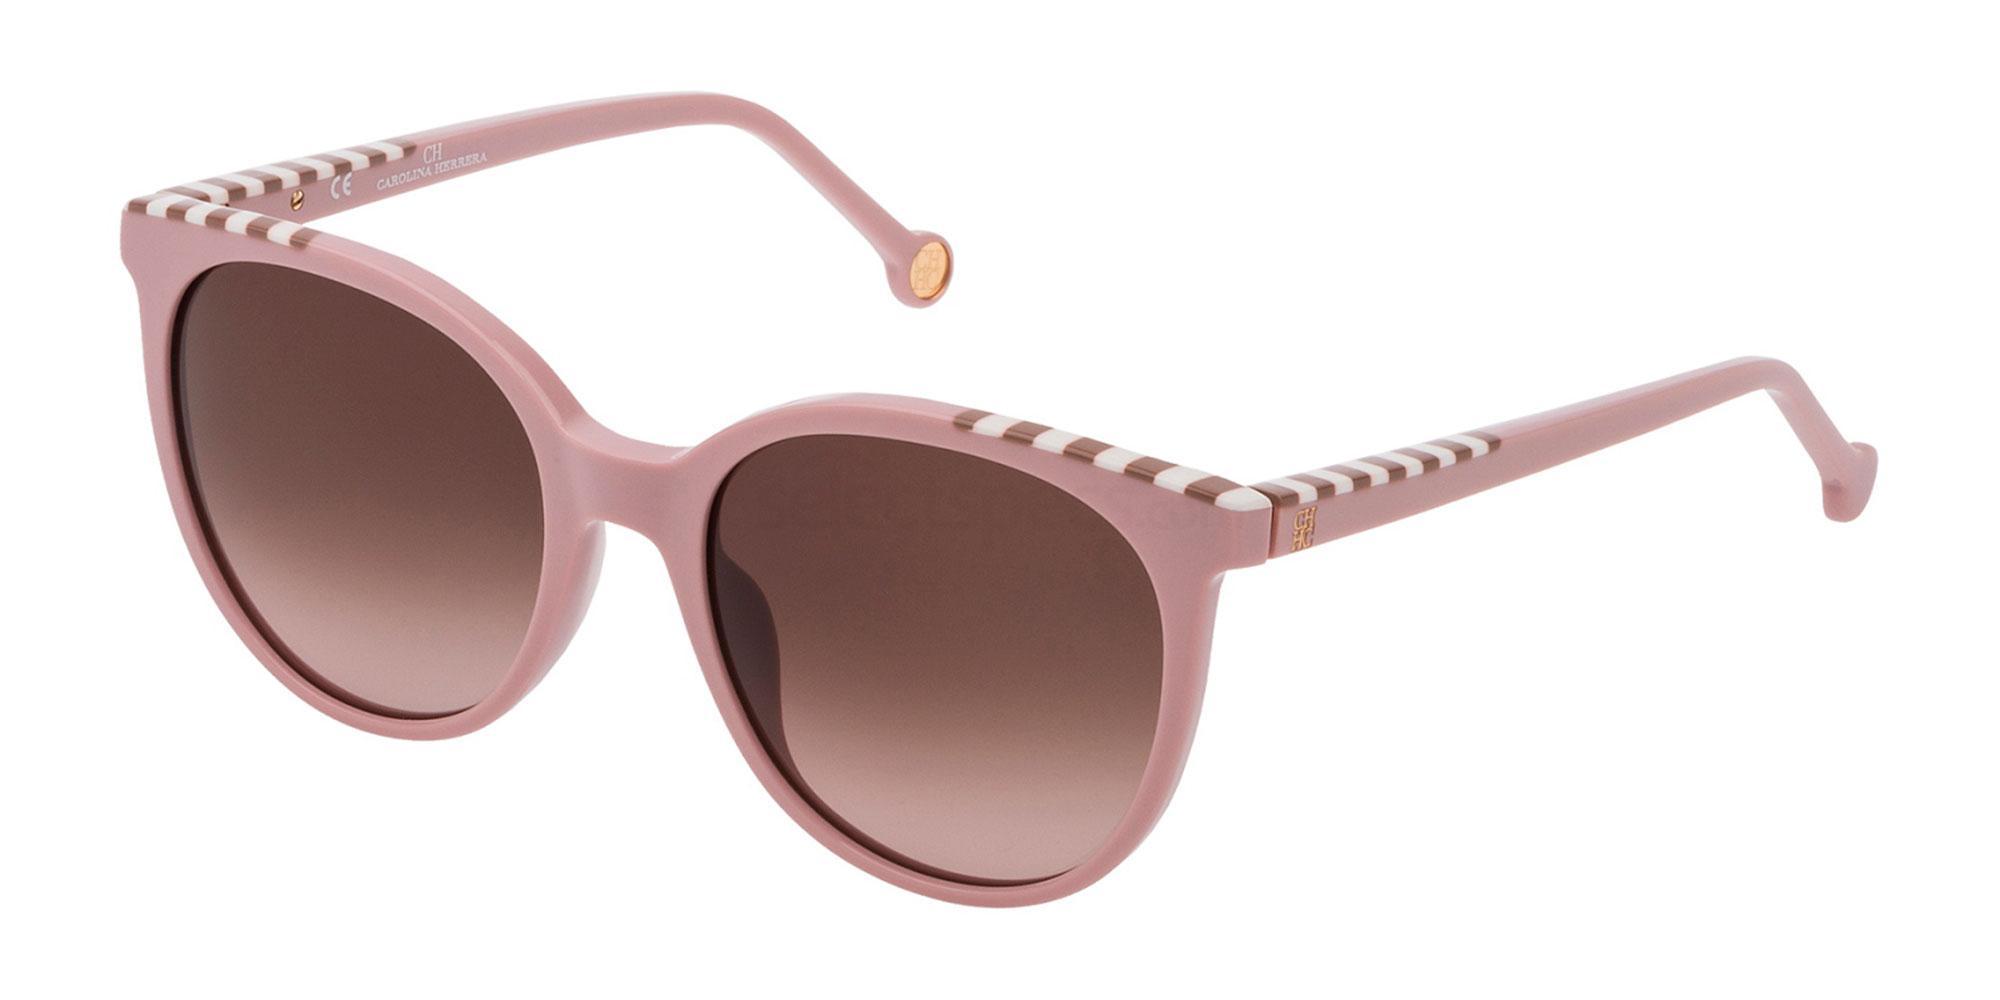 0816 SHE794V Sunglasses, CH Carolina Herrera